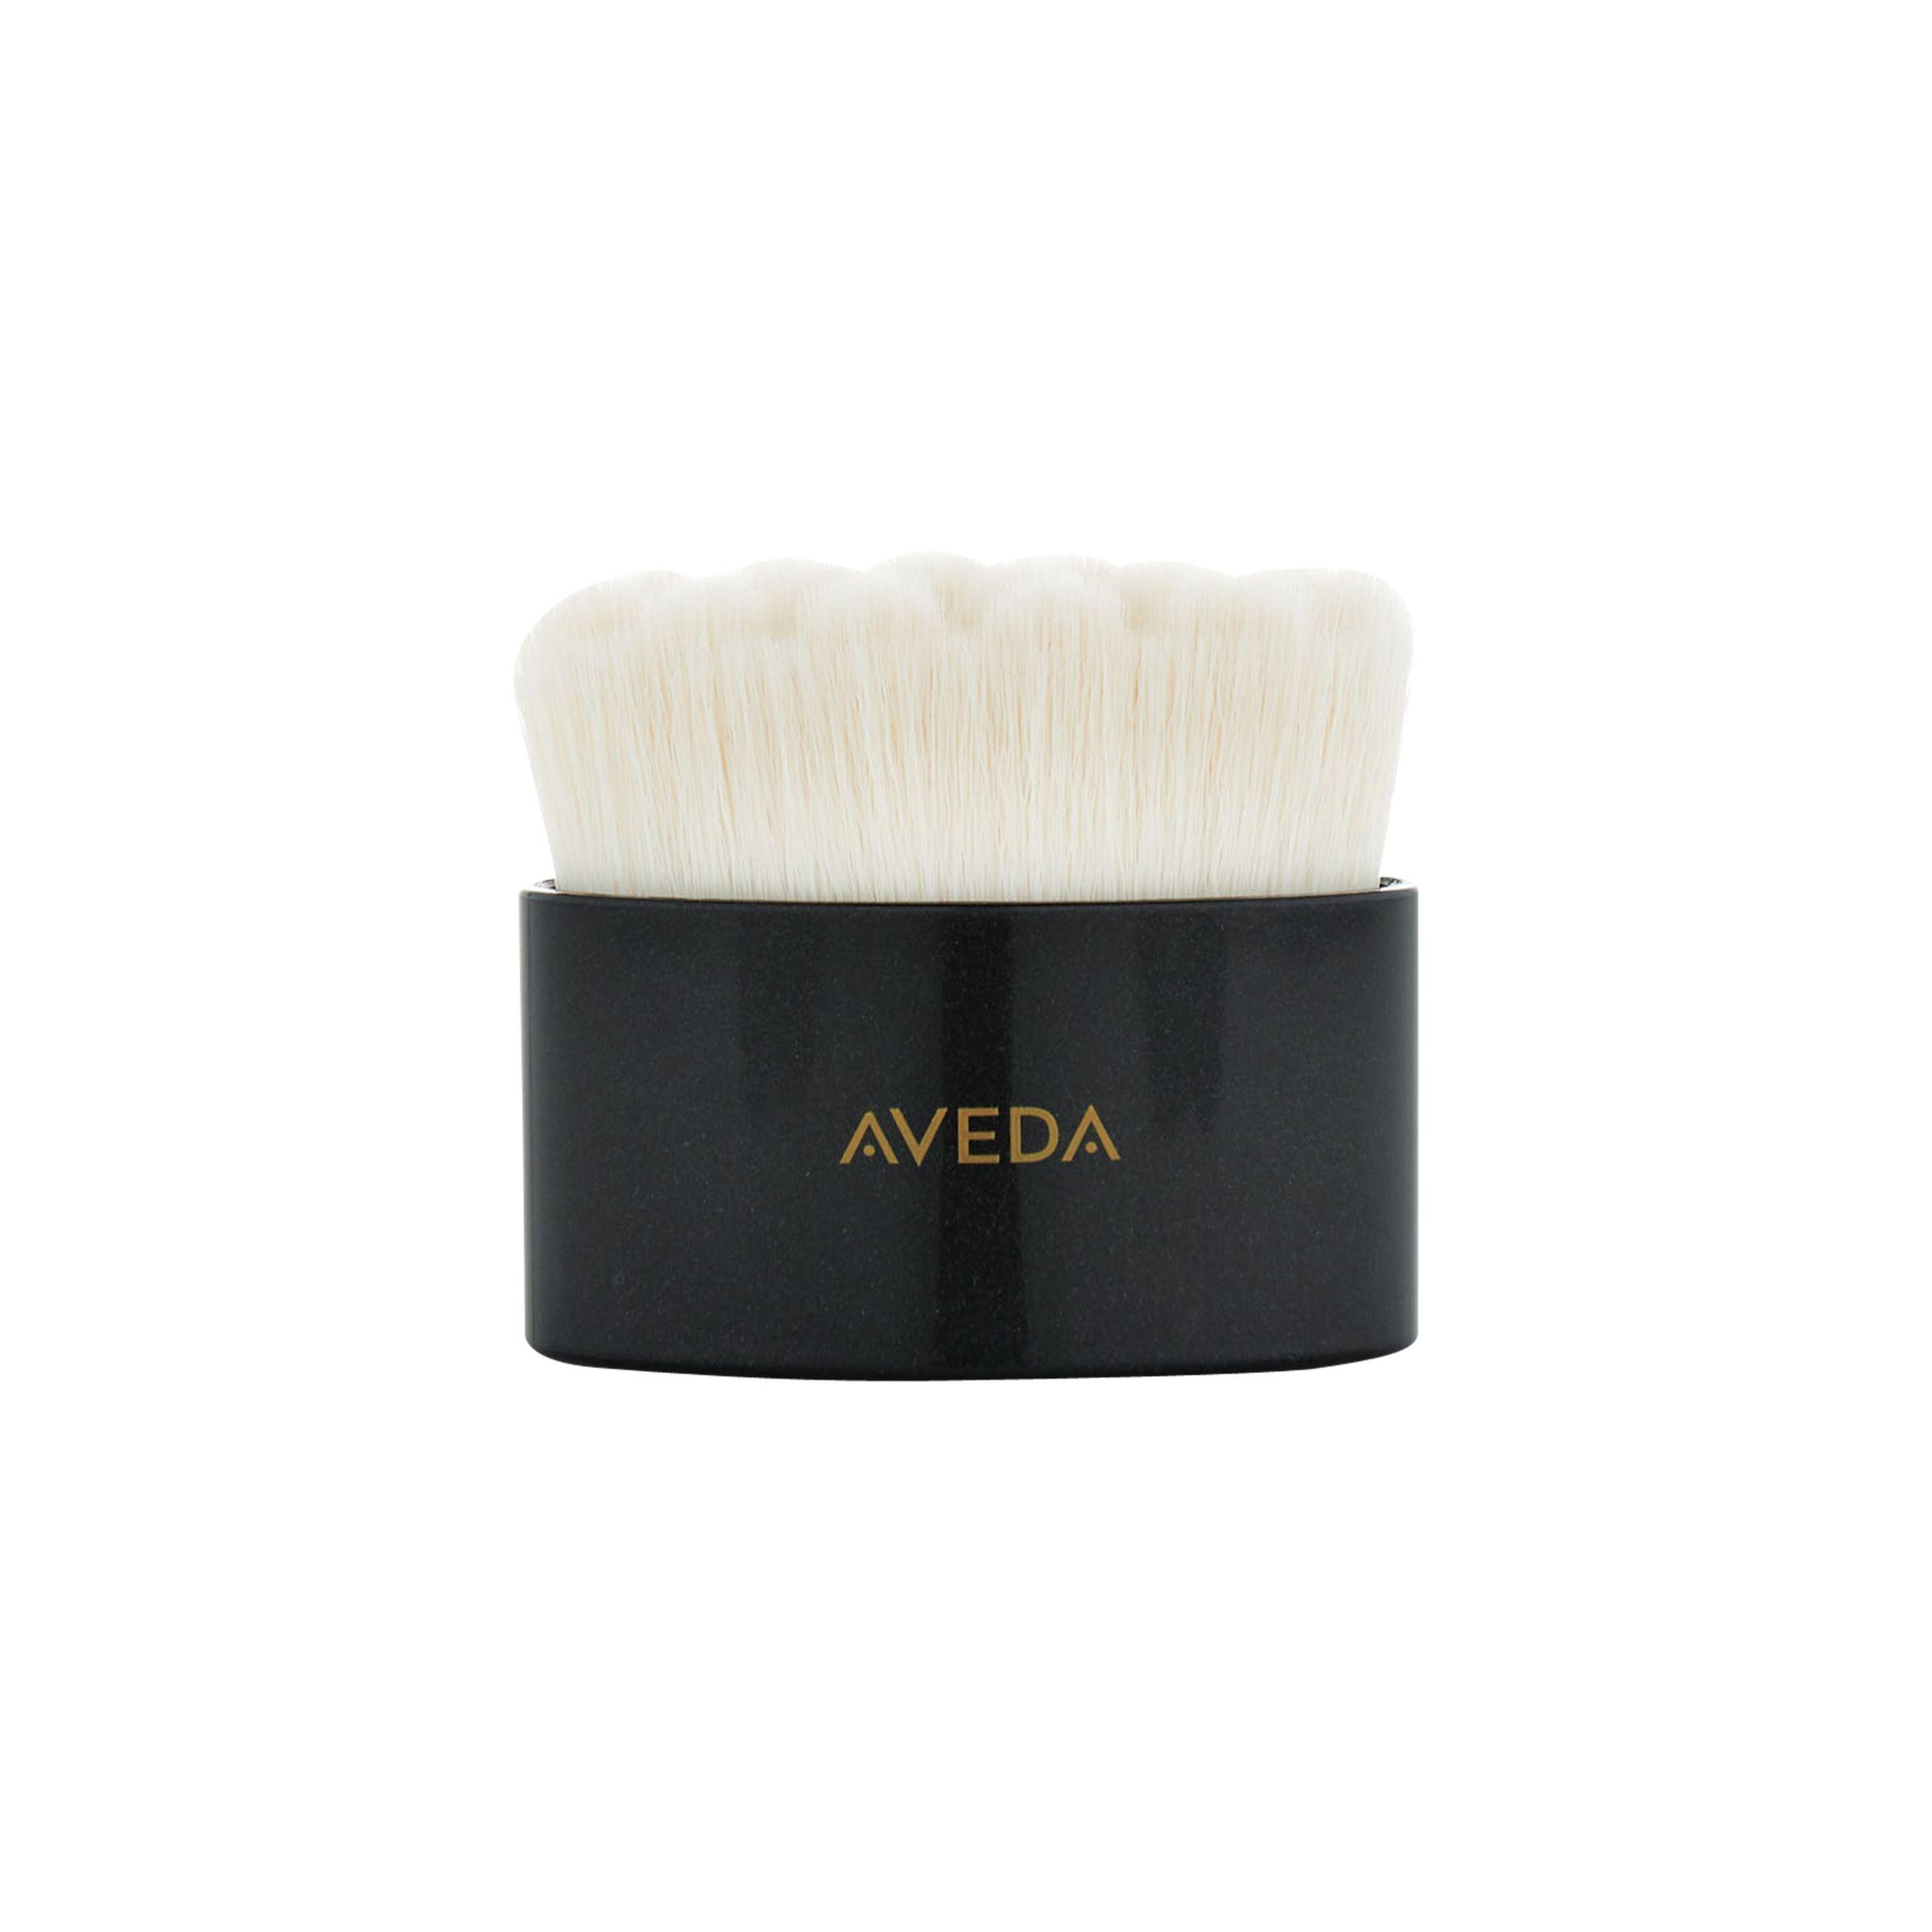 AVEDA AVEDA Tulasara Radiant Facial Dry Brush